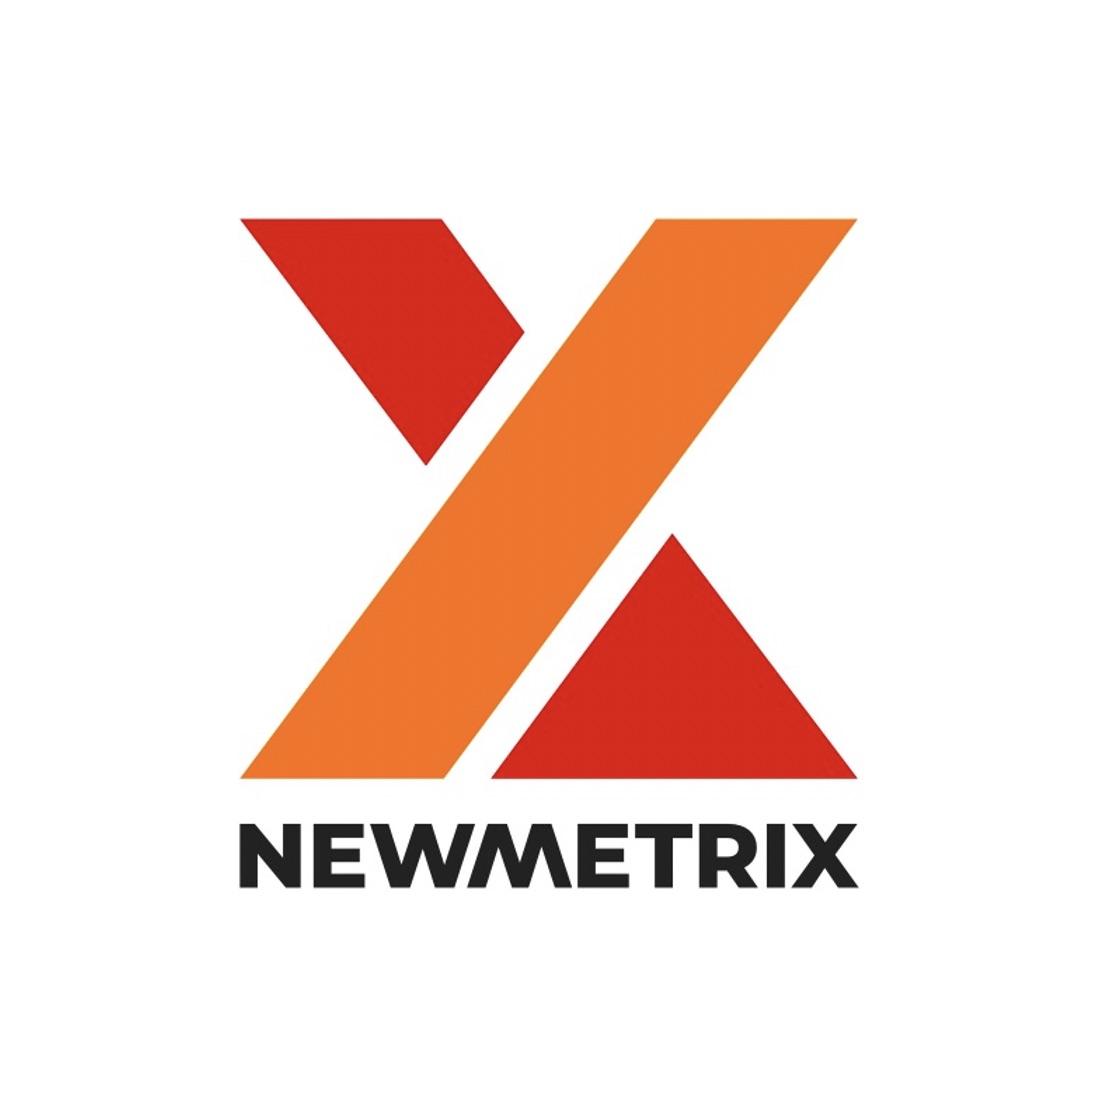 Newmetrix